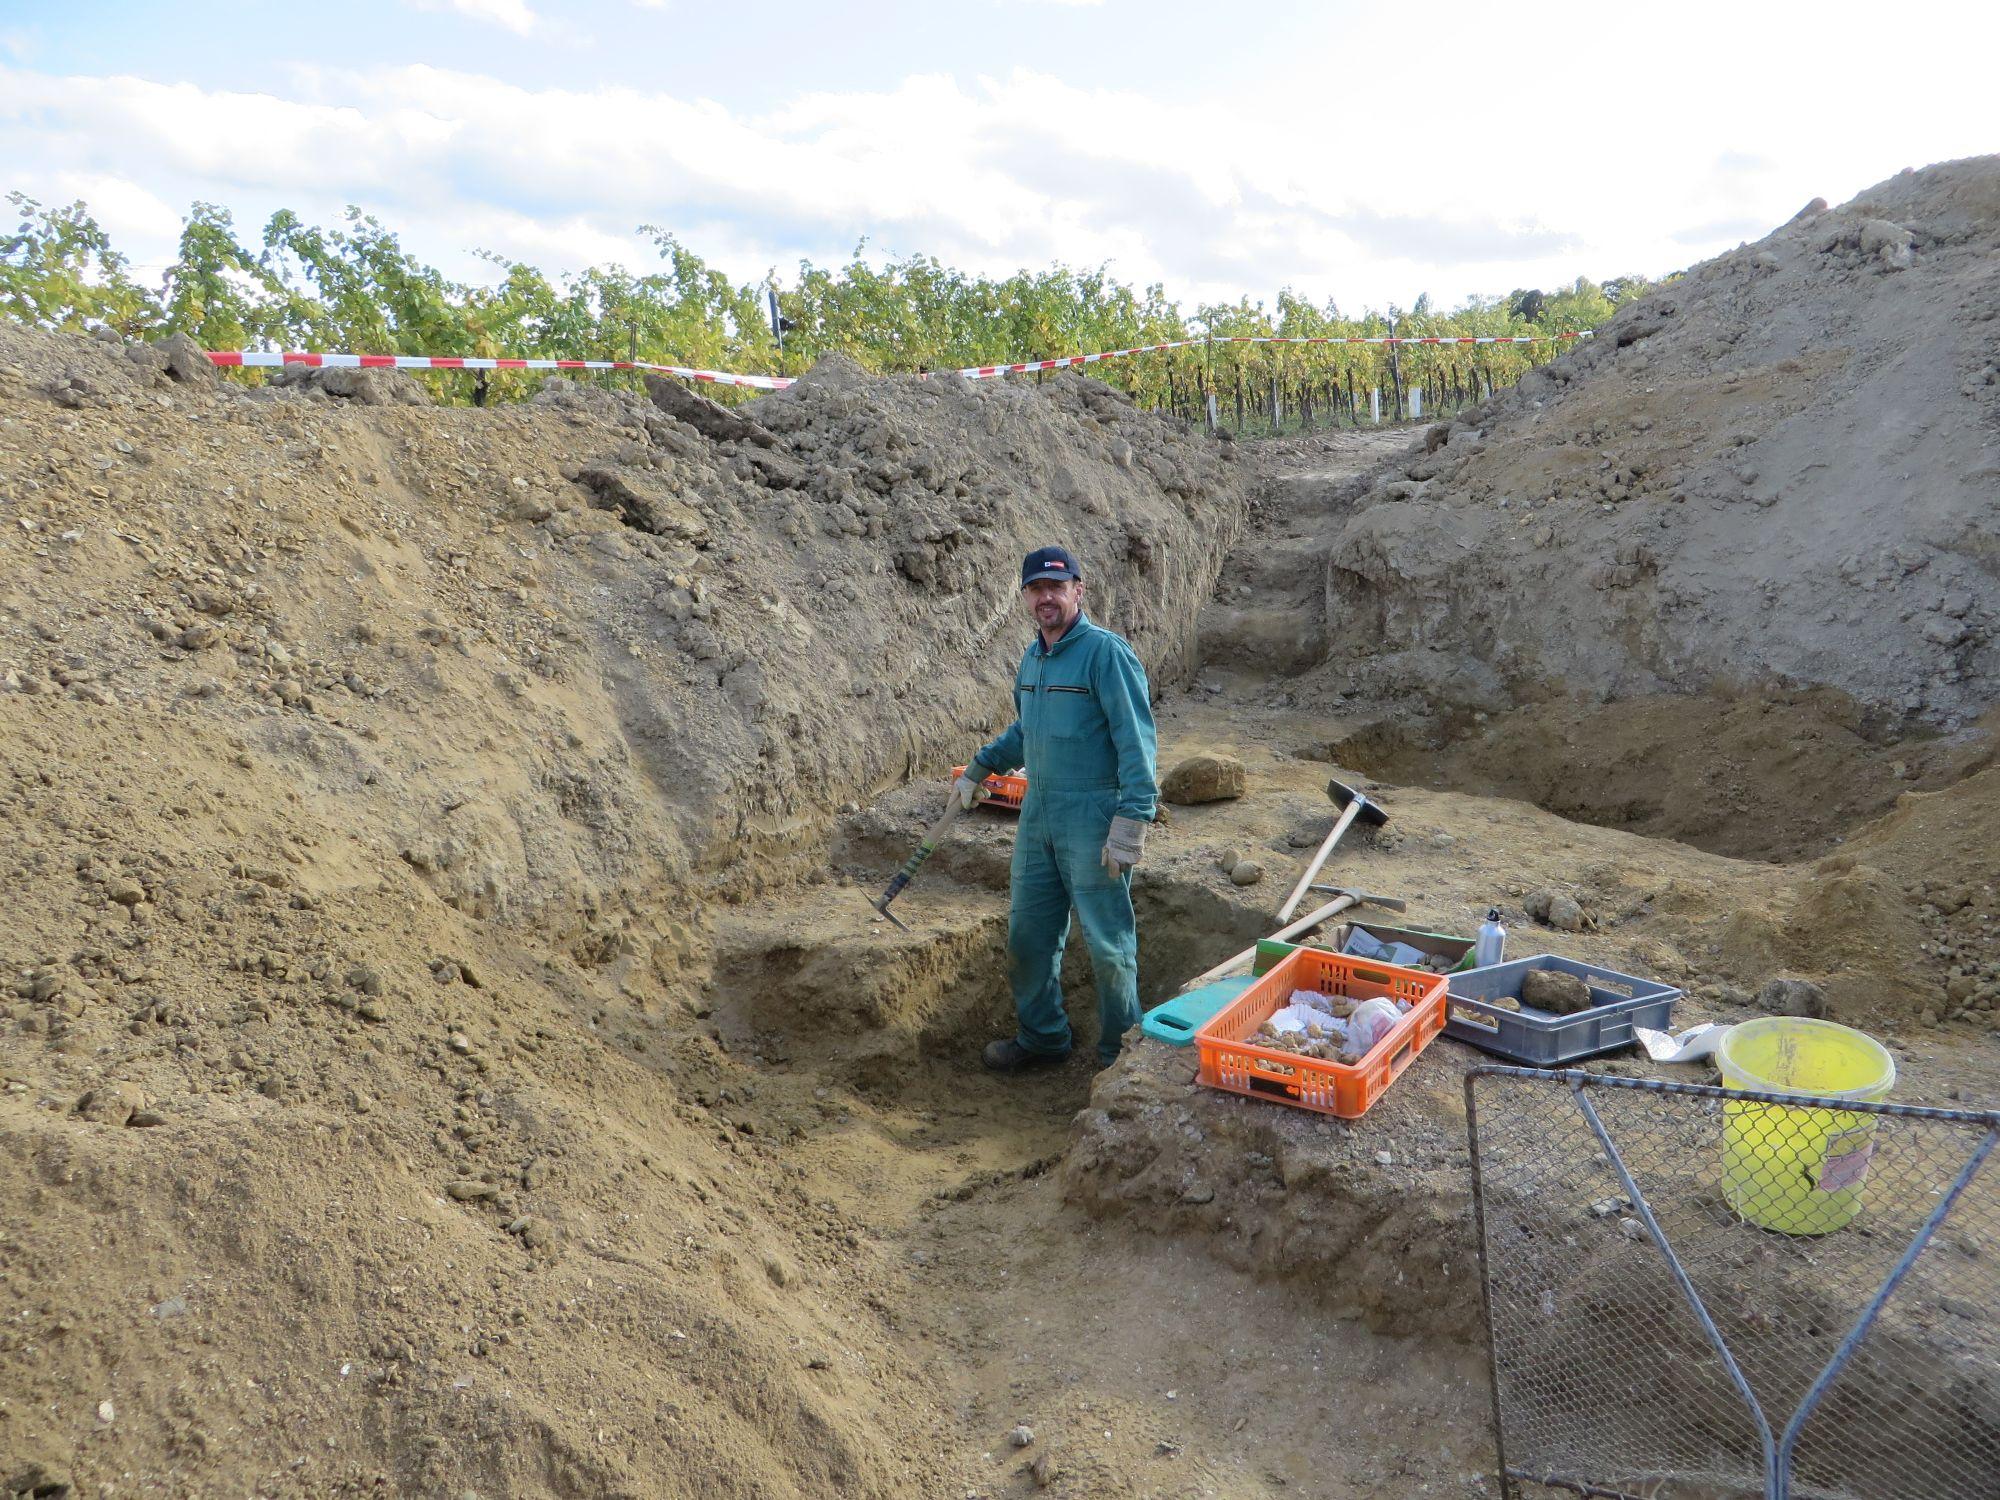 Grabung Gainfarn 2019  (c) Gerhard Wanzenböck